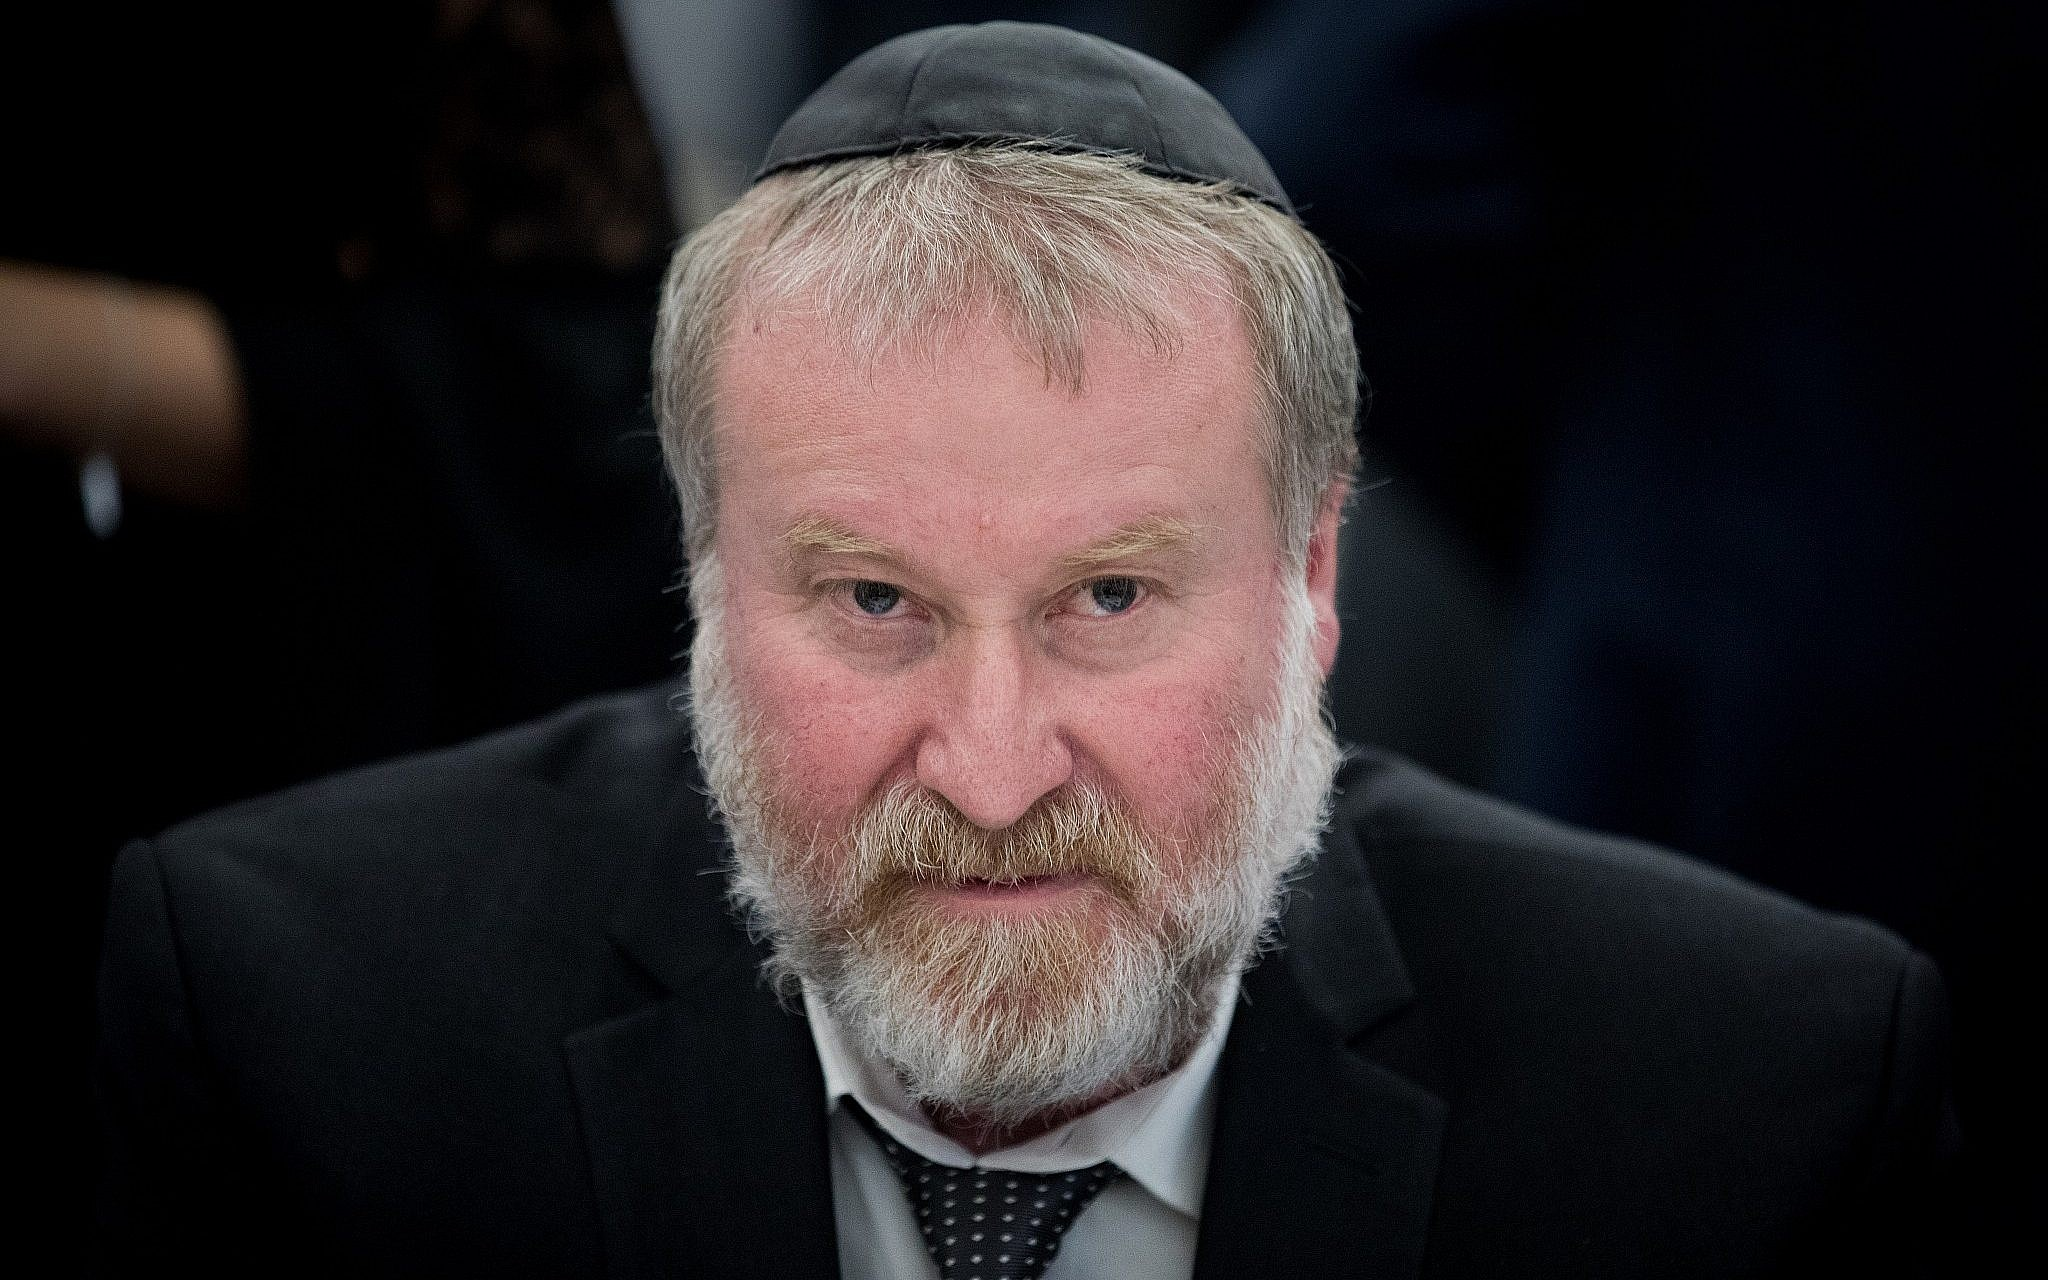 Attorney General Avichai Mandelblit at a conference in Jerusalem on February 5, 2018. (Yonatan Sindel/Flash90)